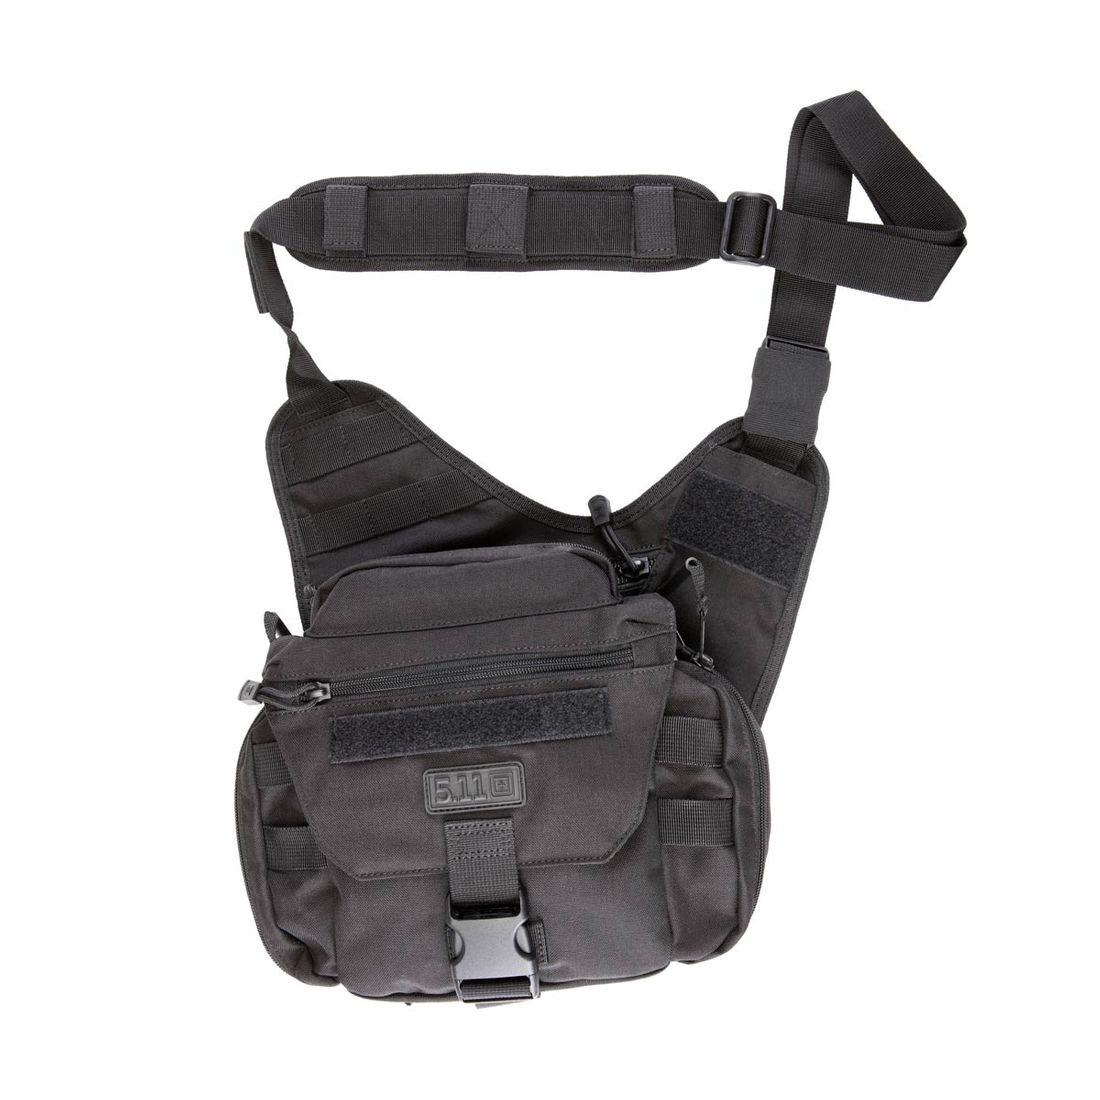 85eb22040db2 Push Pack. Sacoche Push Pack 5.11 Tactical noir (019)